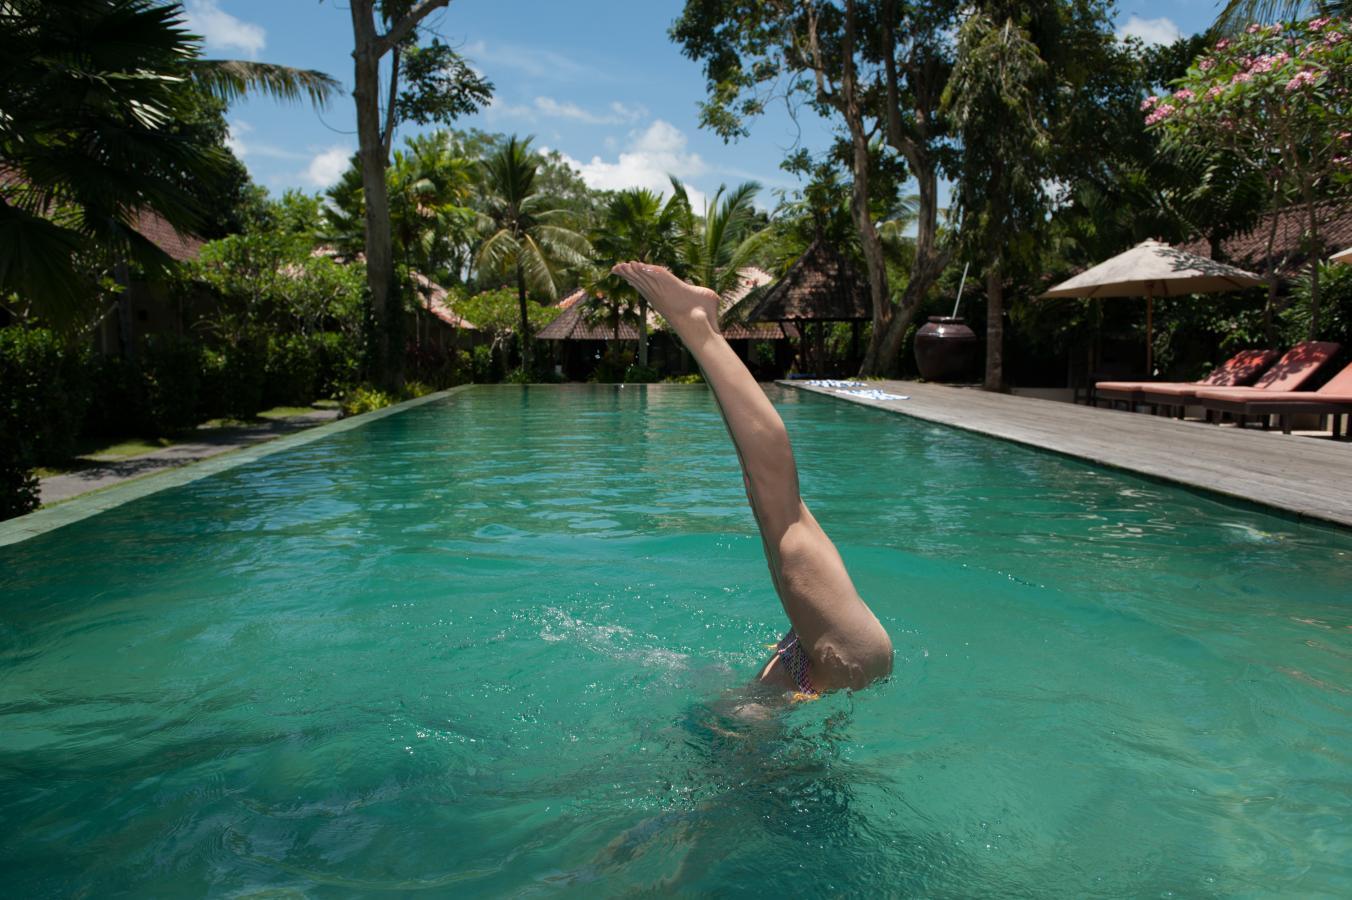 barbara-swimming-ubud-bali-2013